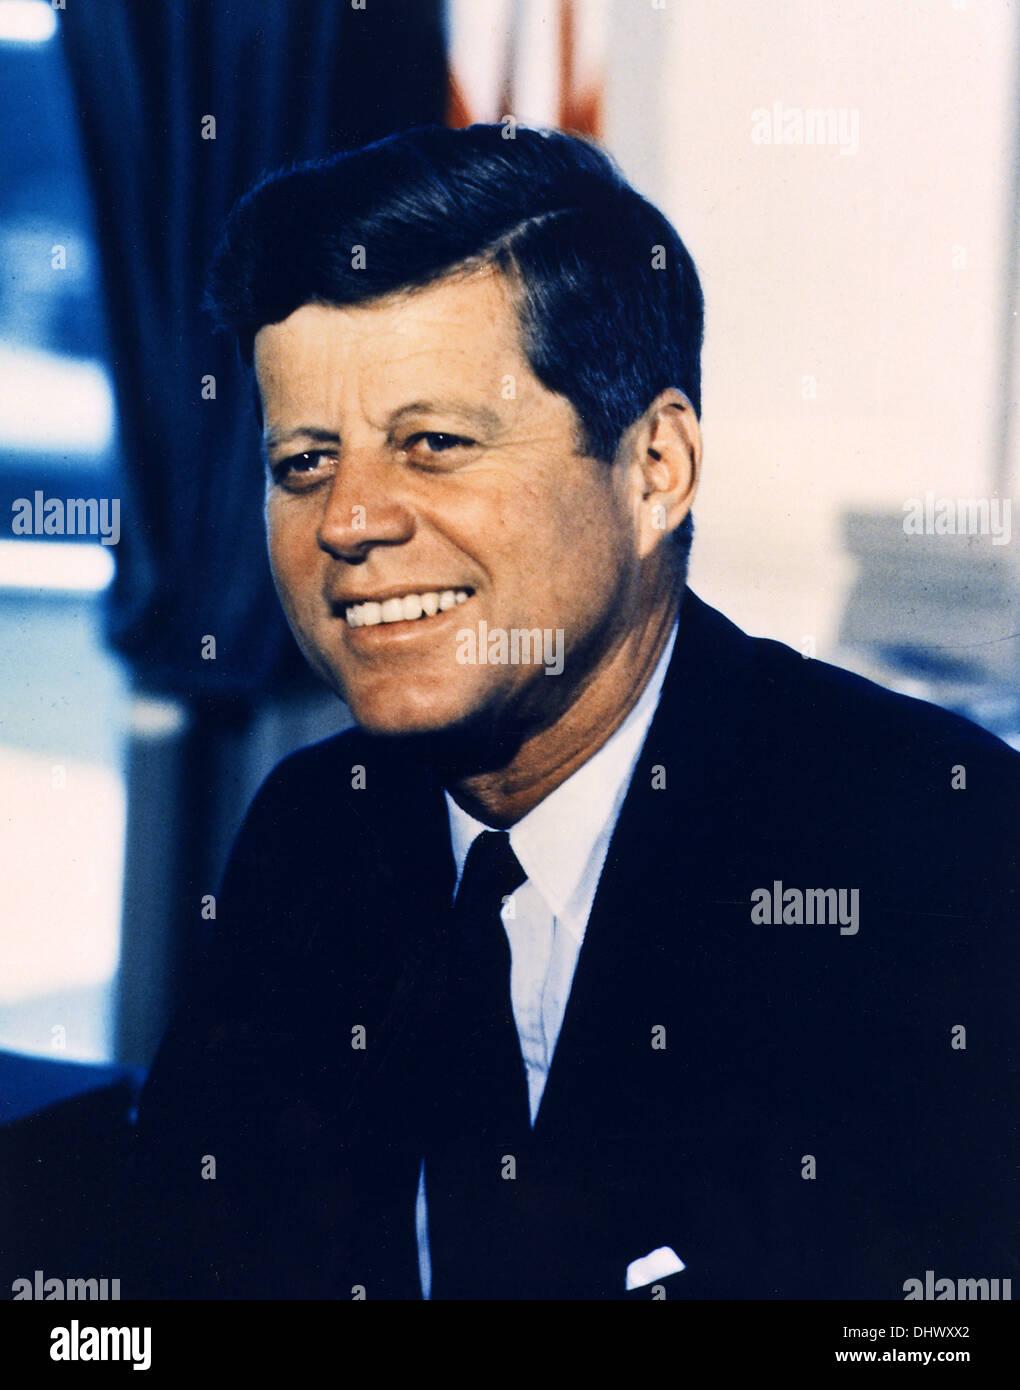 El Presidente John F. Kennedy, el Presidente norteamericano JFK Foto de stock